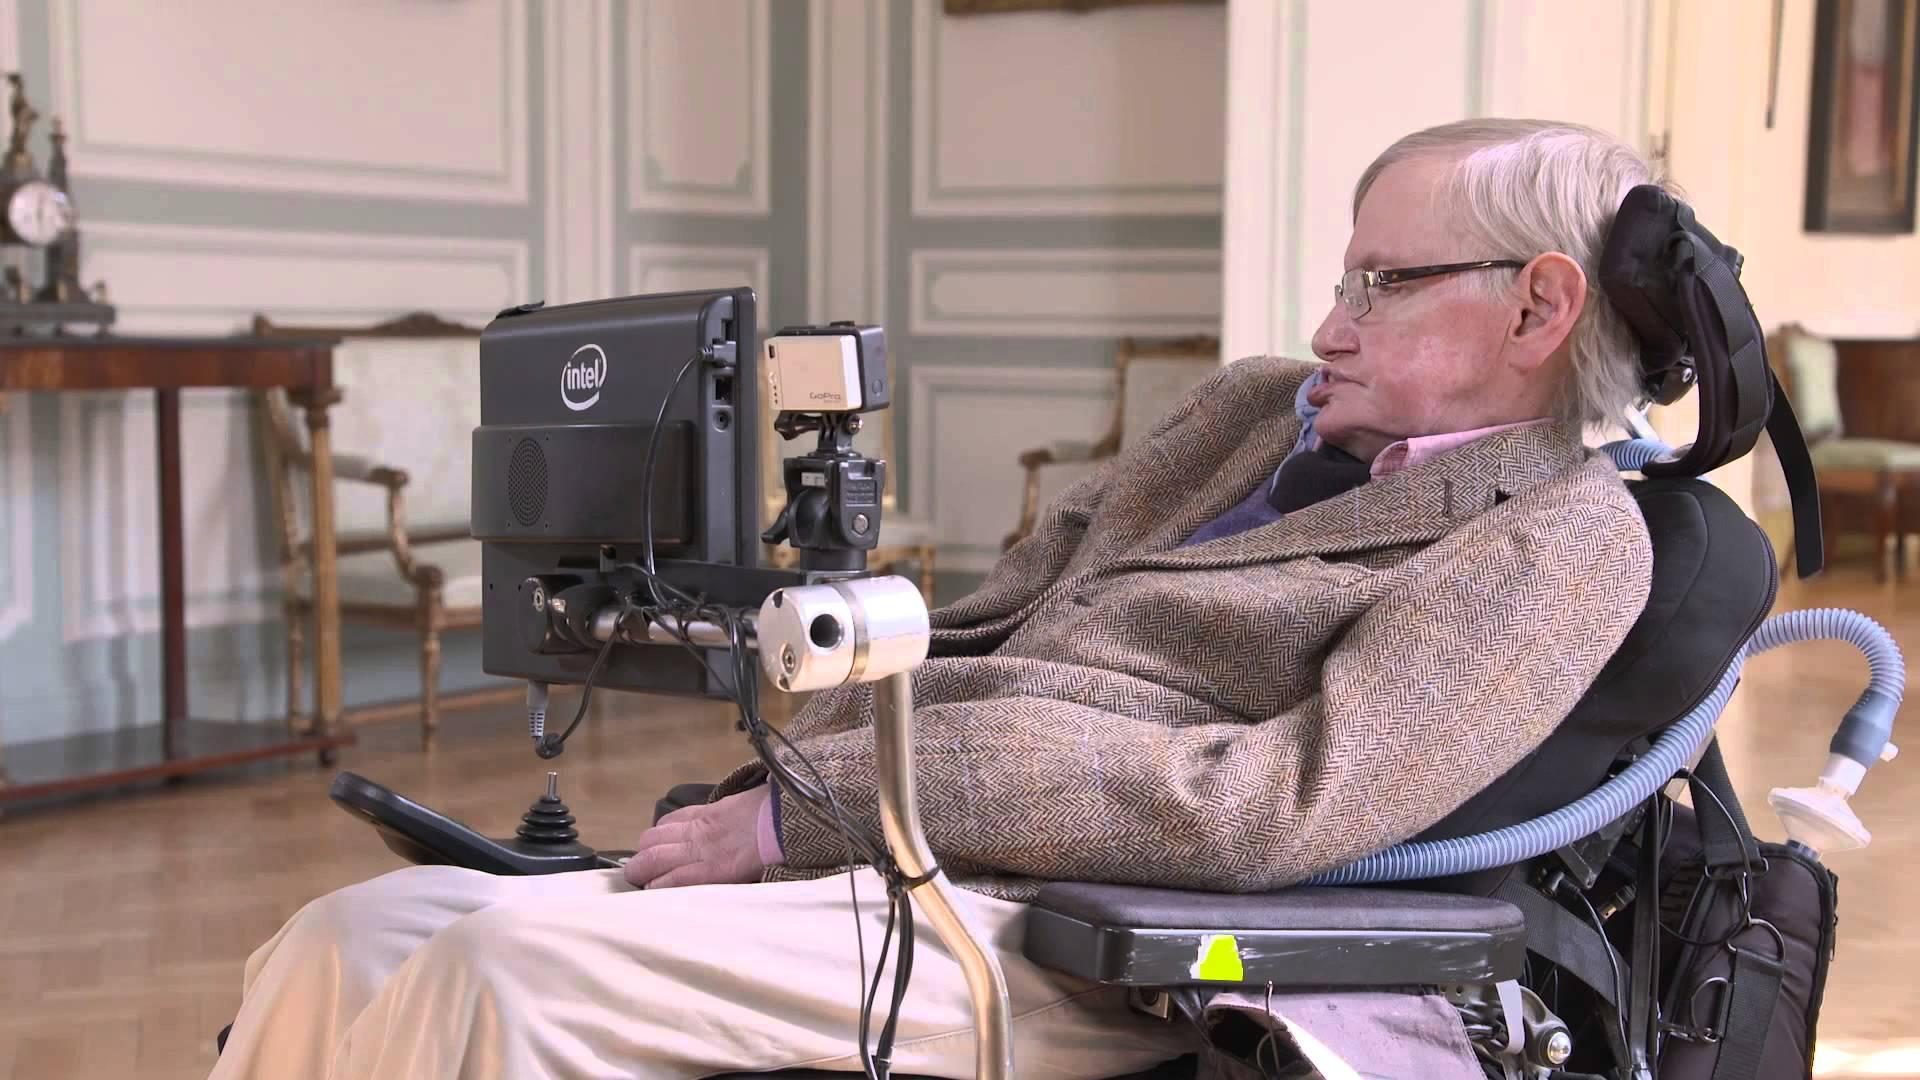 Love Animated Wallpaper For Mobile Stephen Hawking Wallpaper Hd